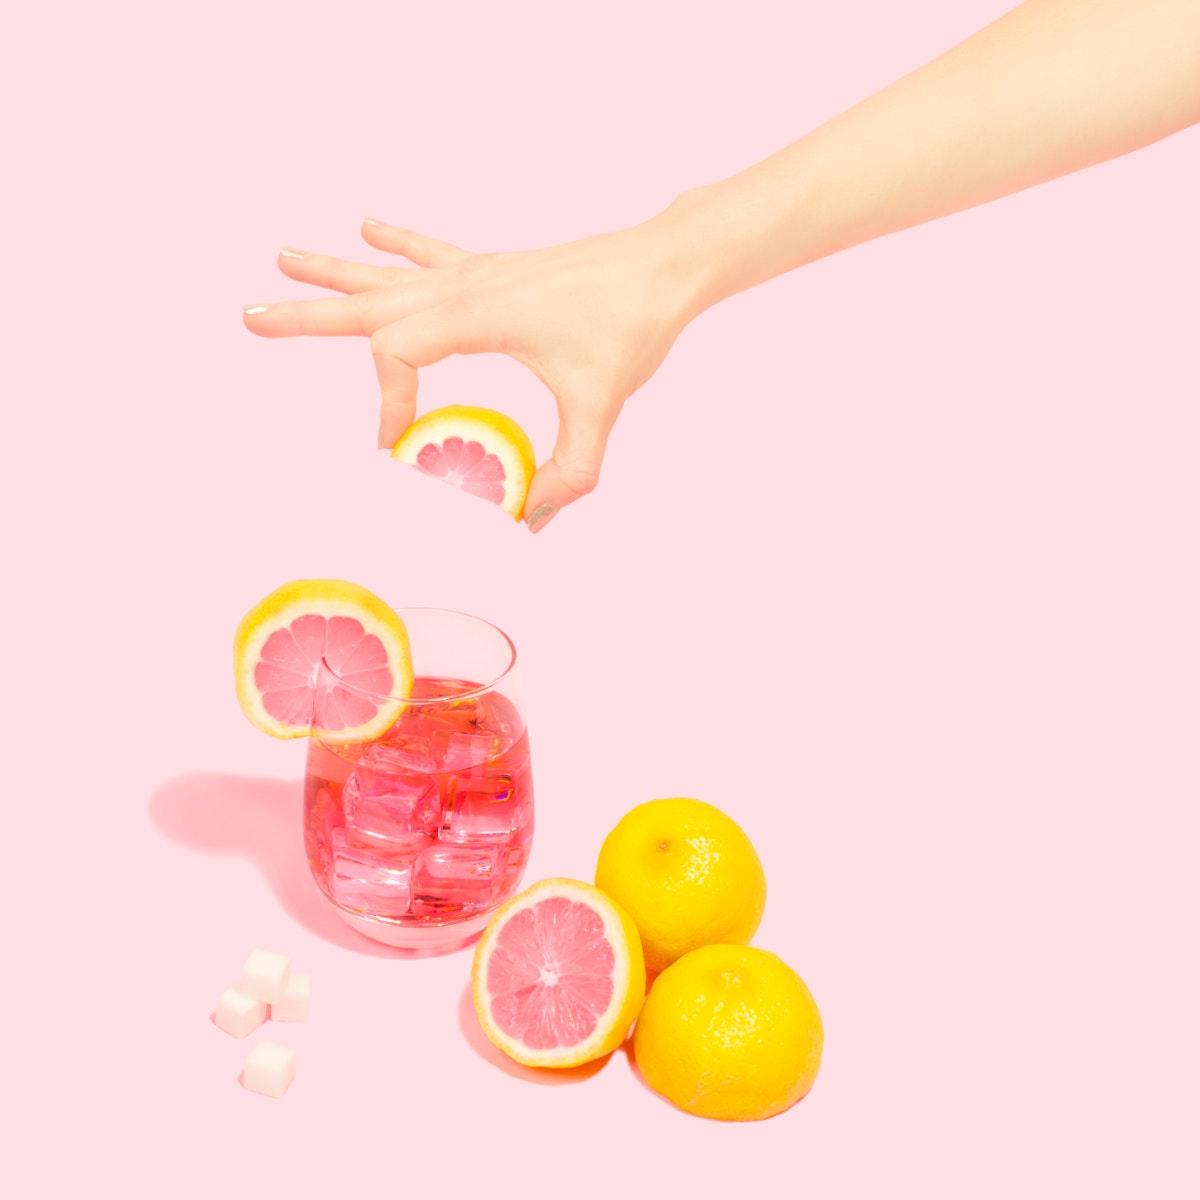 Woman squeezing fresh variegated eureka juice